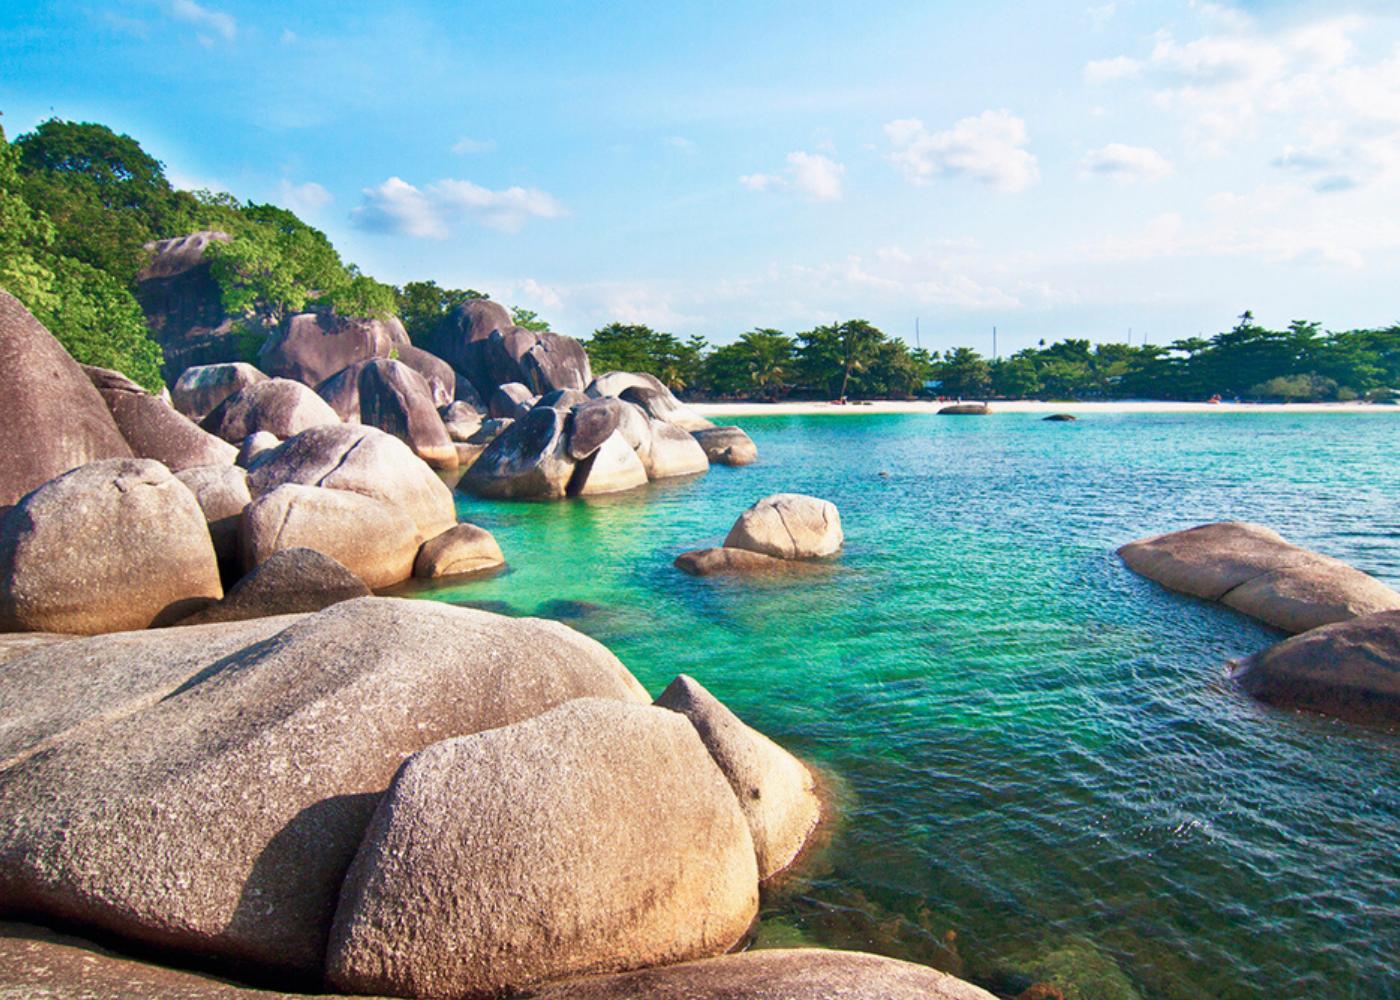 Find these granite stones along Tanjung Tinggi Beach.